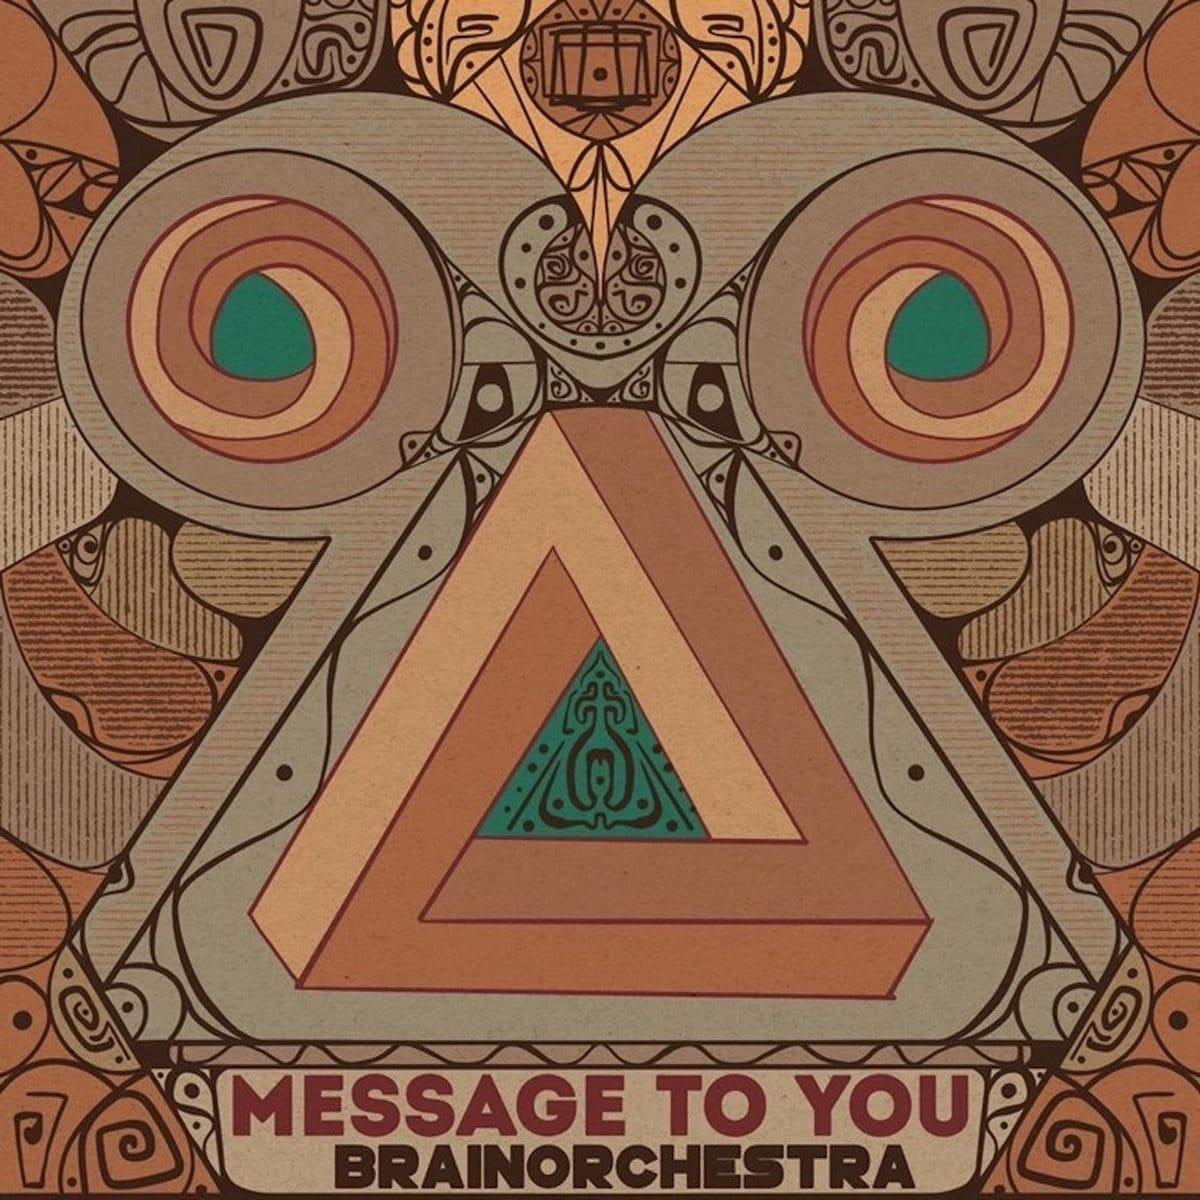 brainorchestra message to you